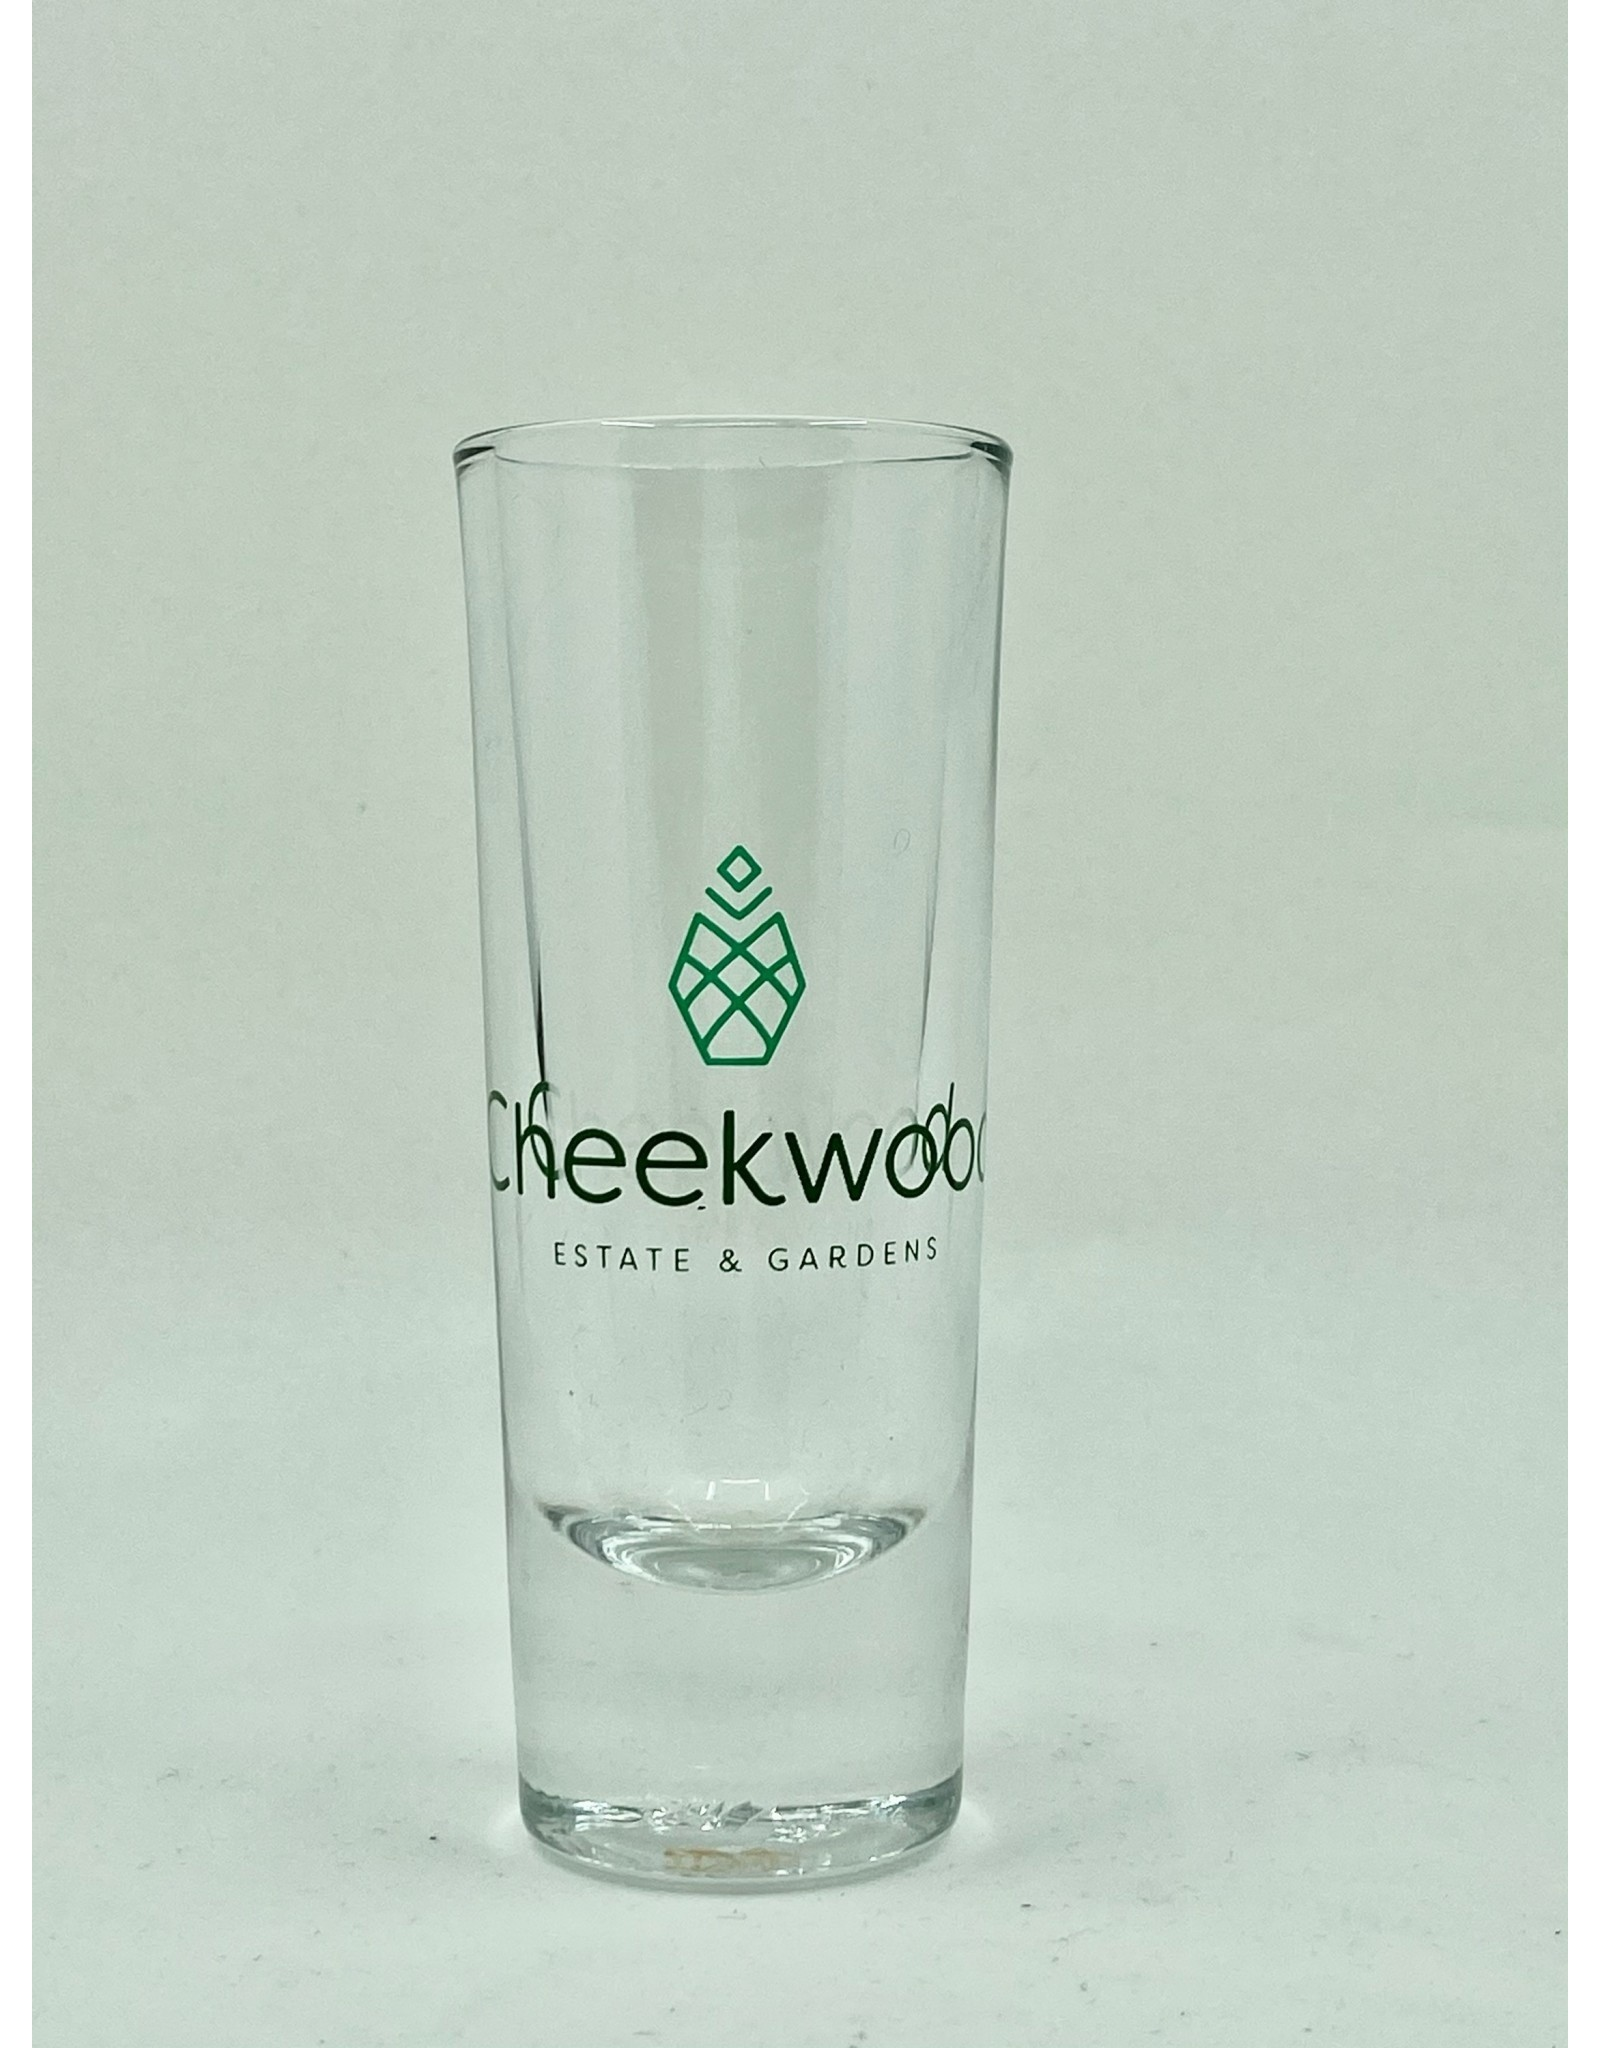 Cheekwood Shot Glass